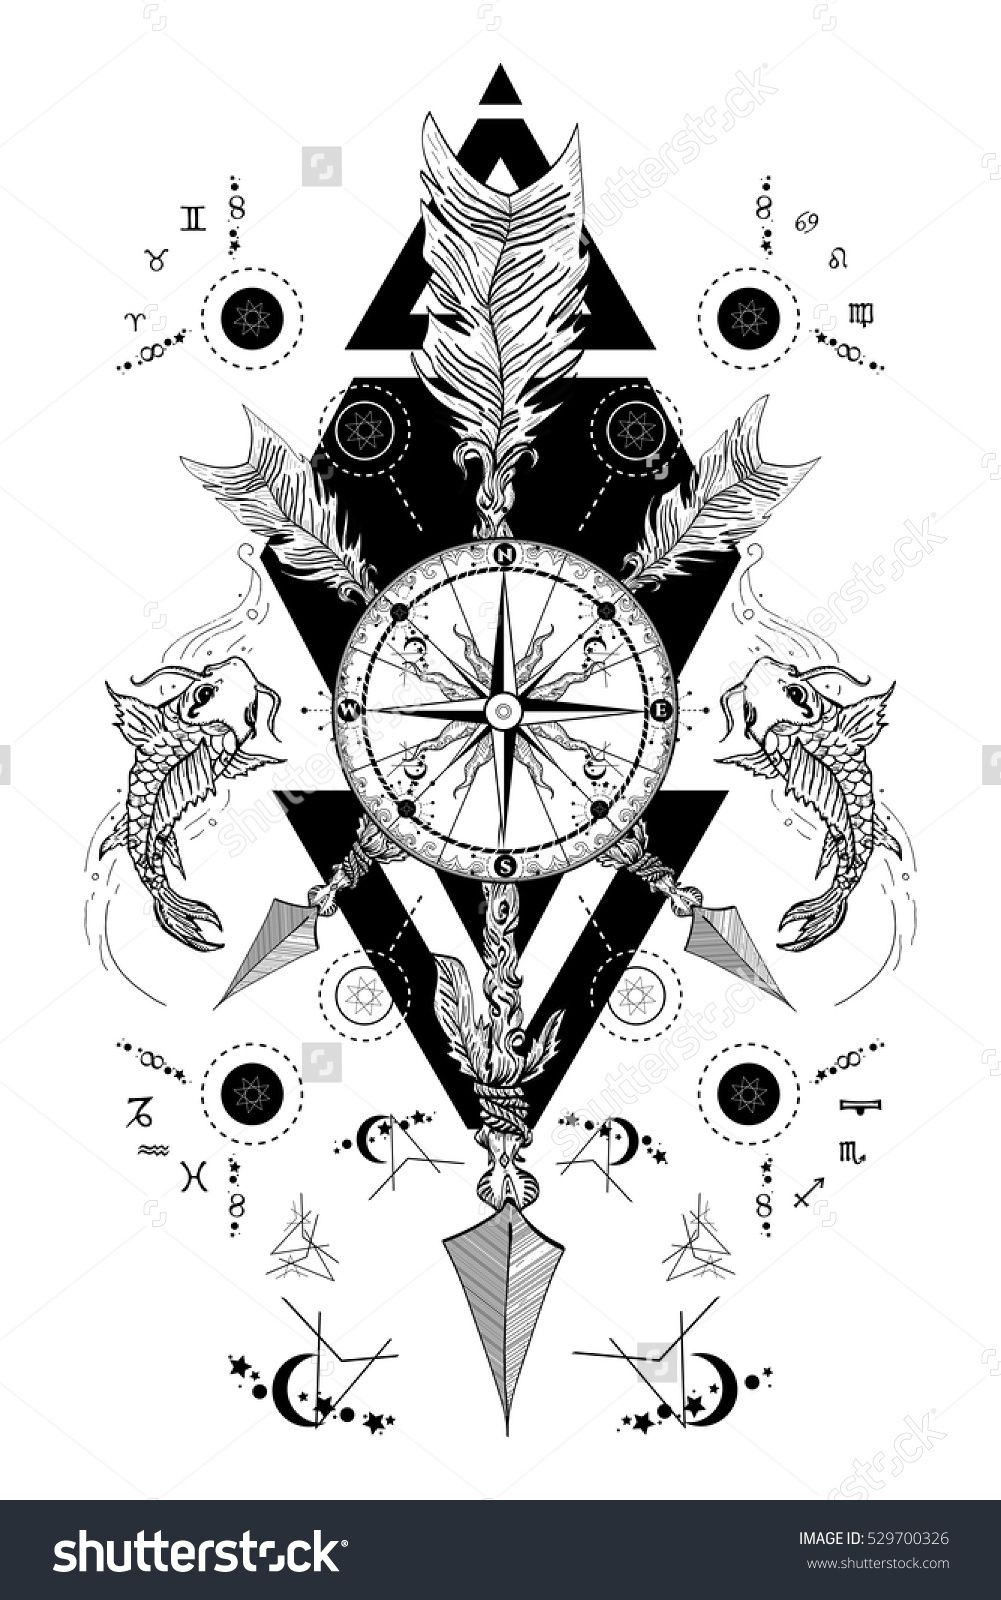 Medieval Rose Compass Carps And Crossed Arrows Tattoo Art Boho